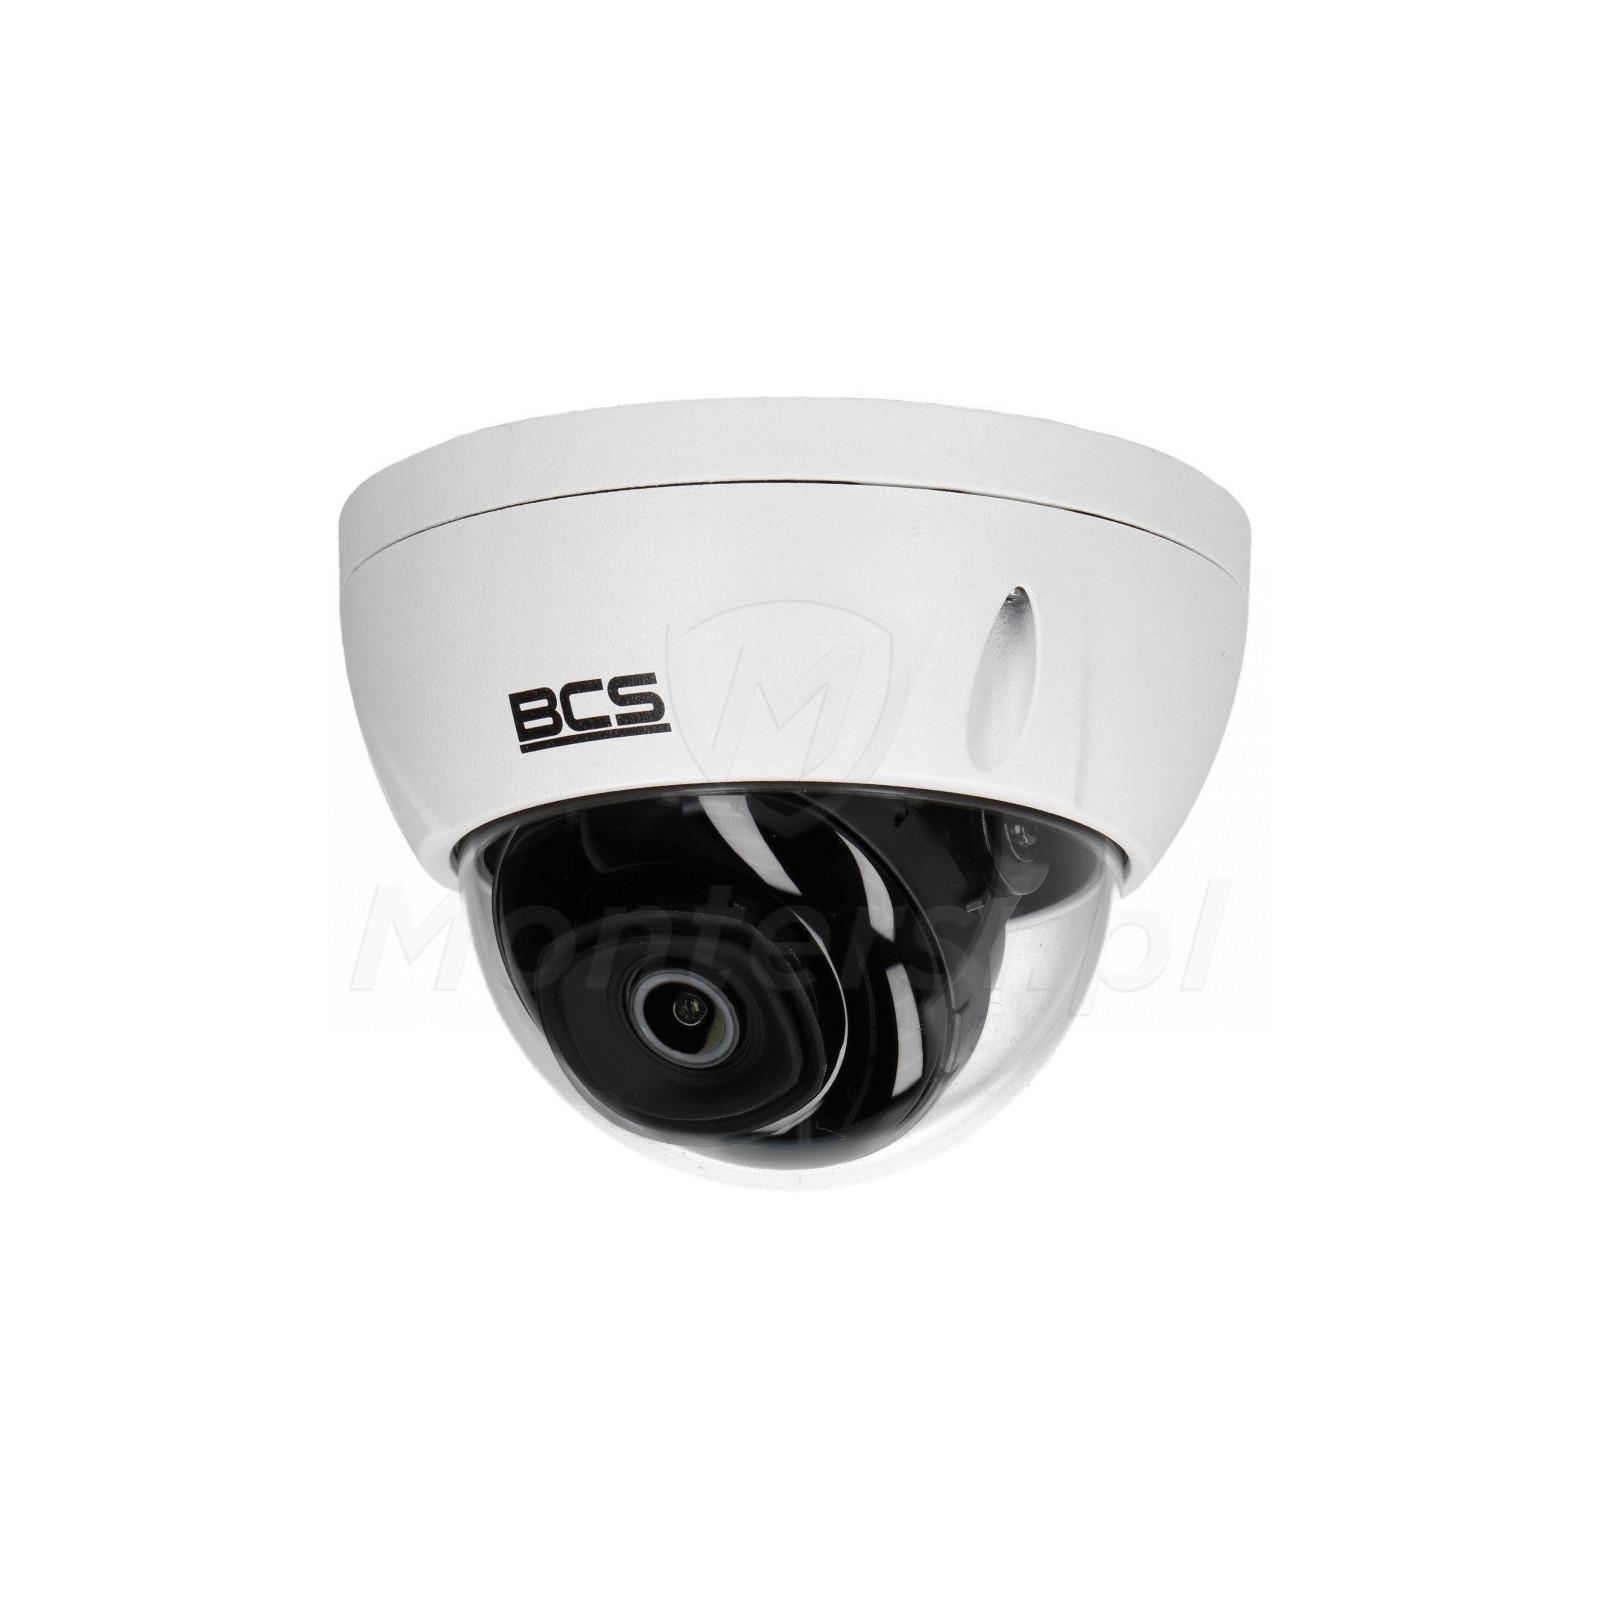 Kamera wandaloodporna IP BCS-DMIP3201IR-E-Ai